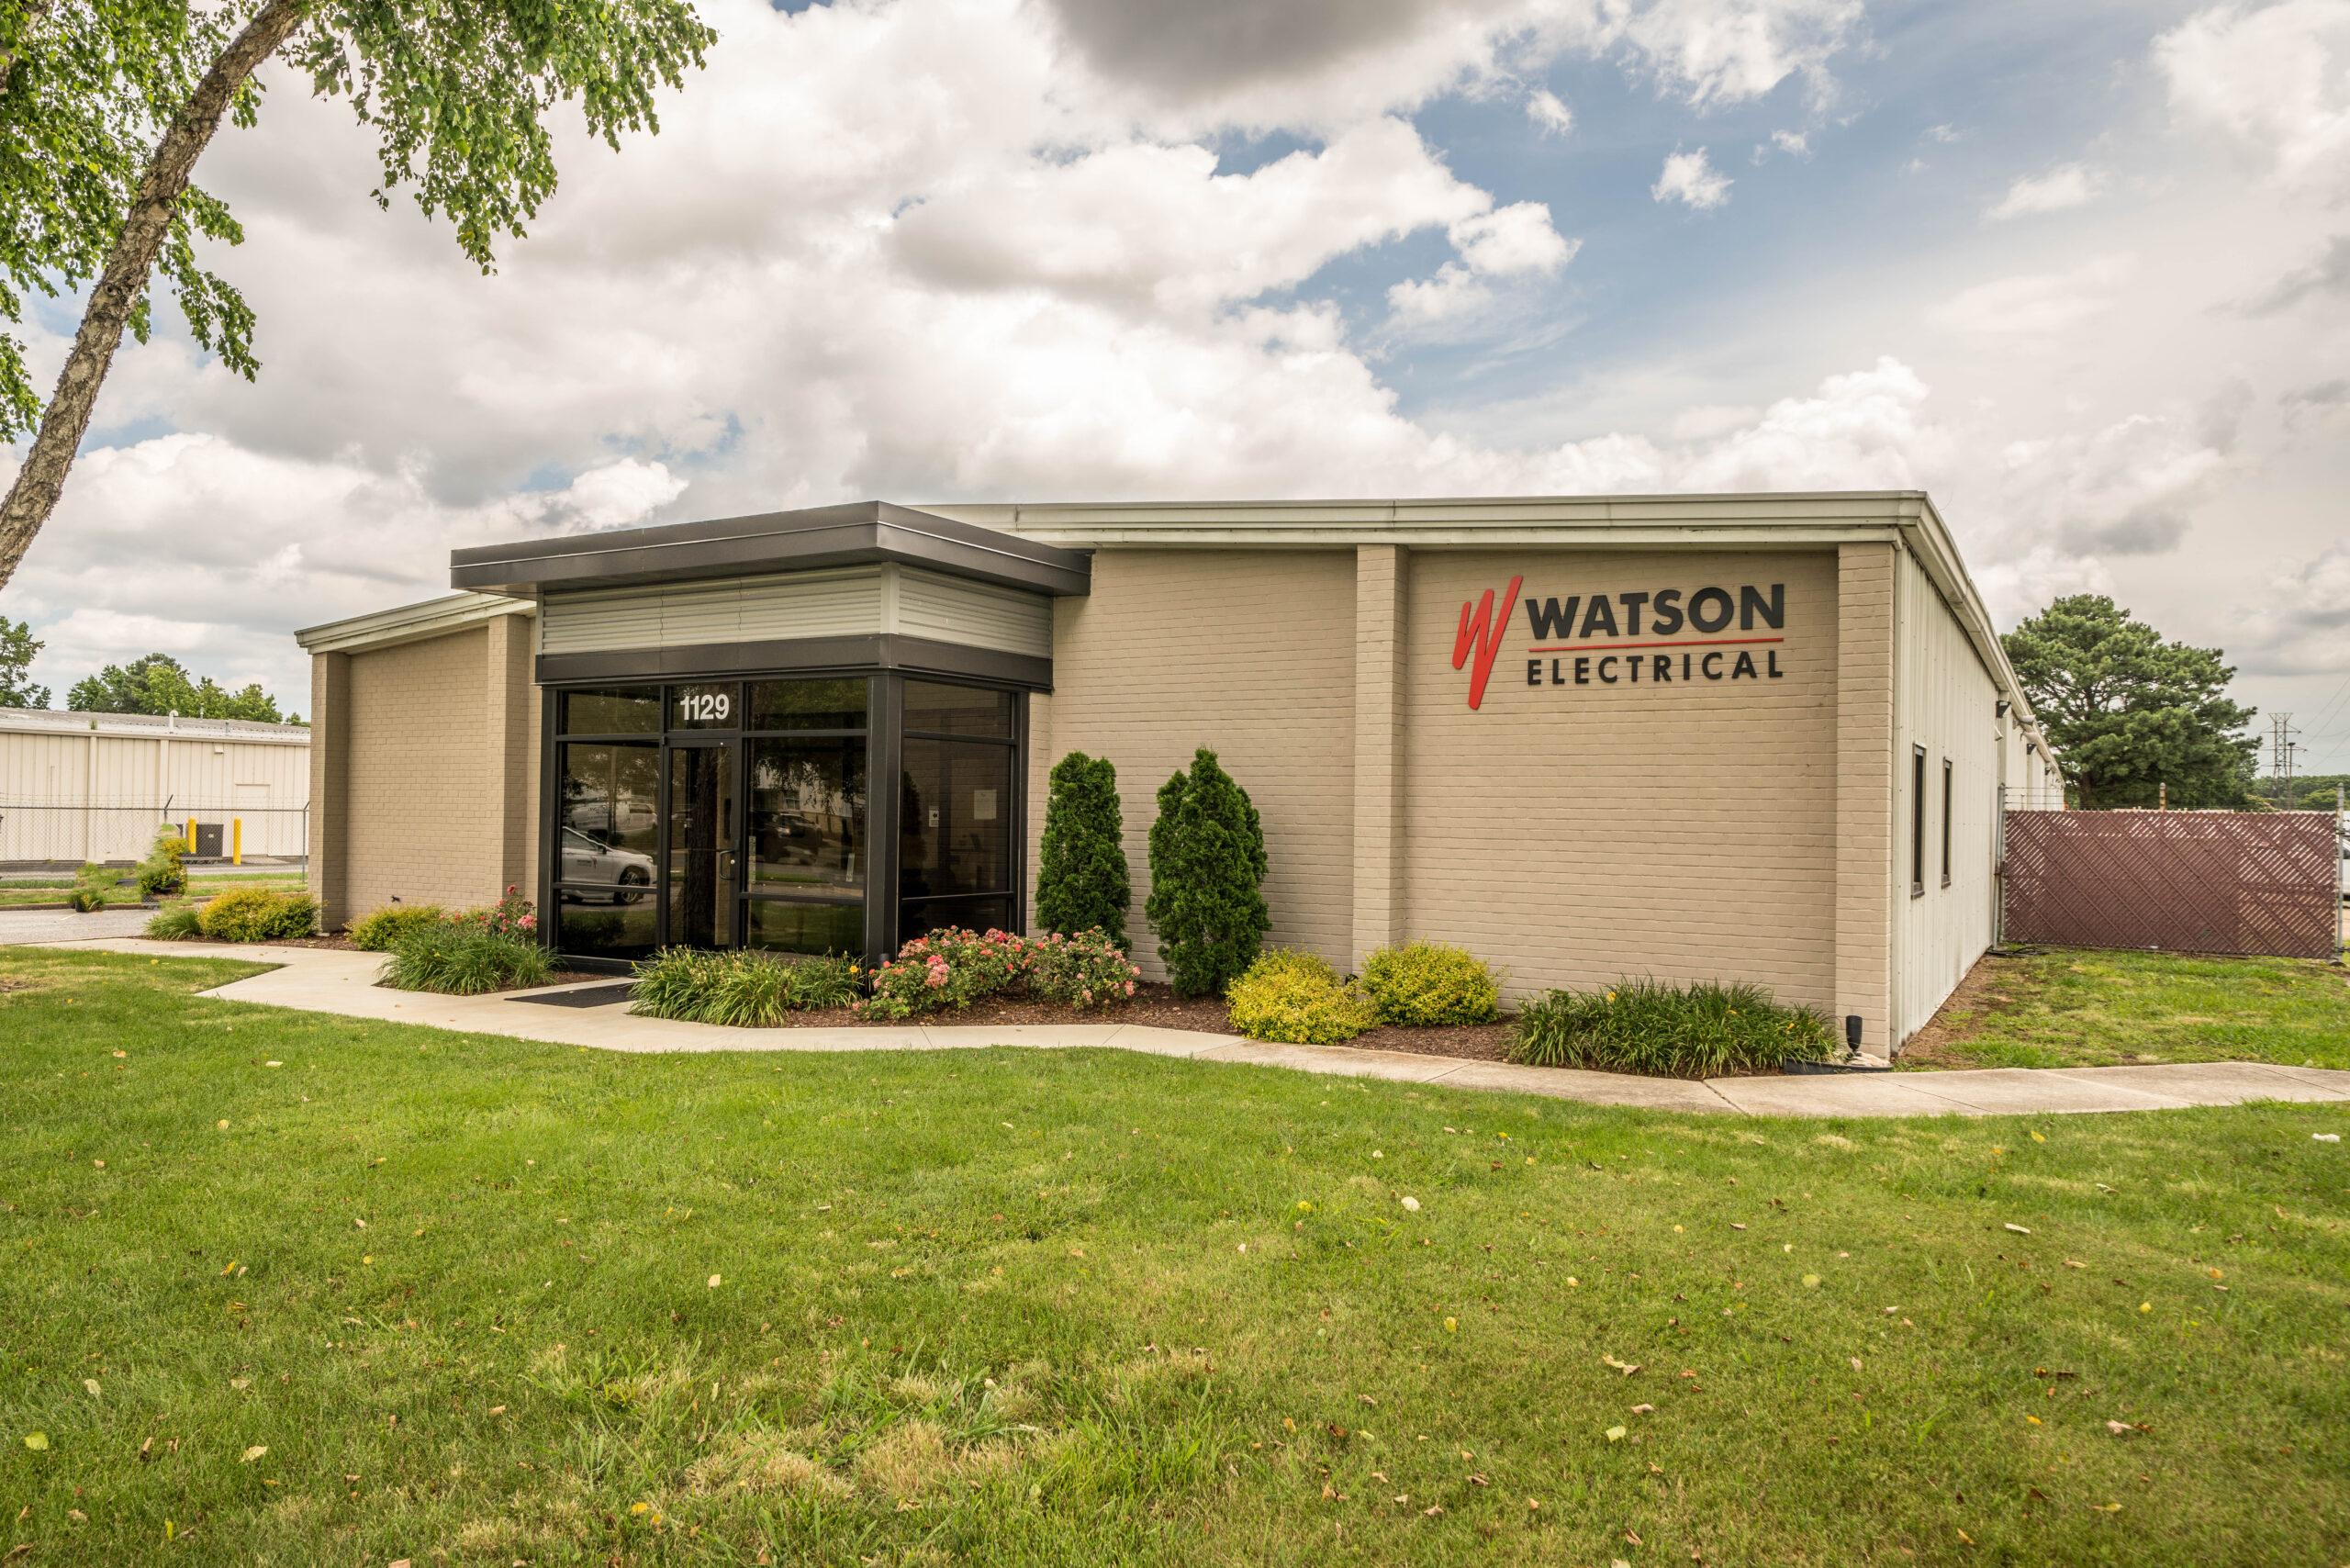 Watson Electrical Construction Company Renovation